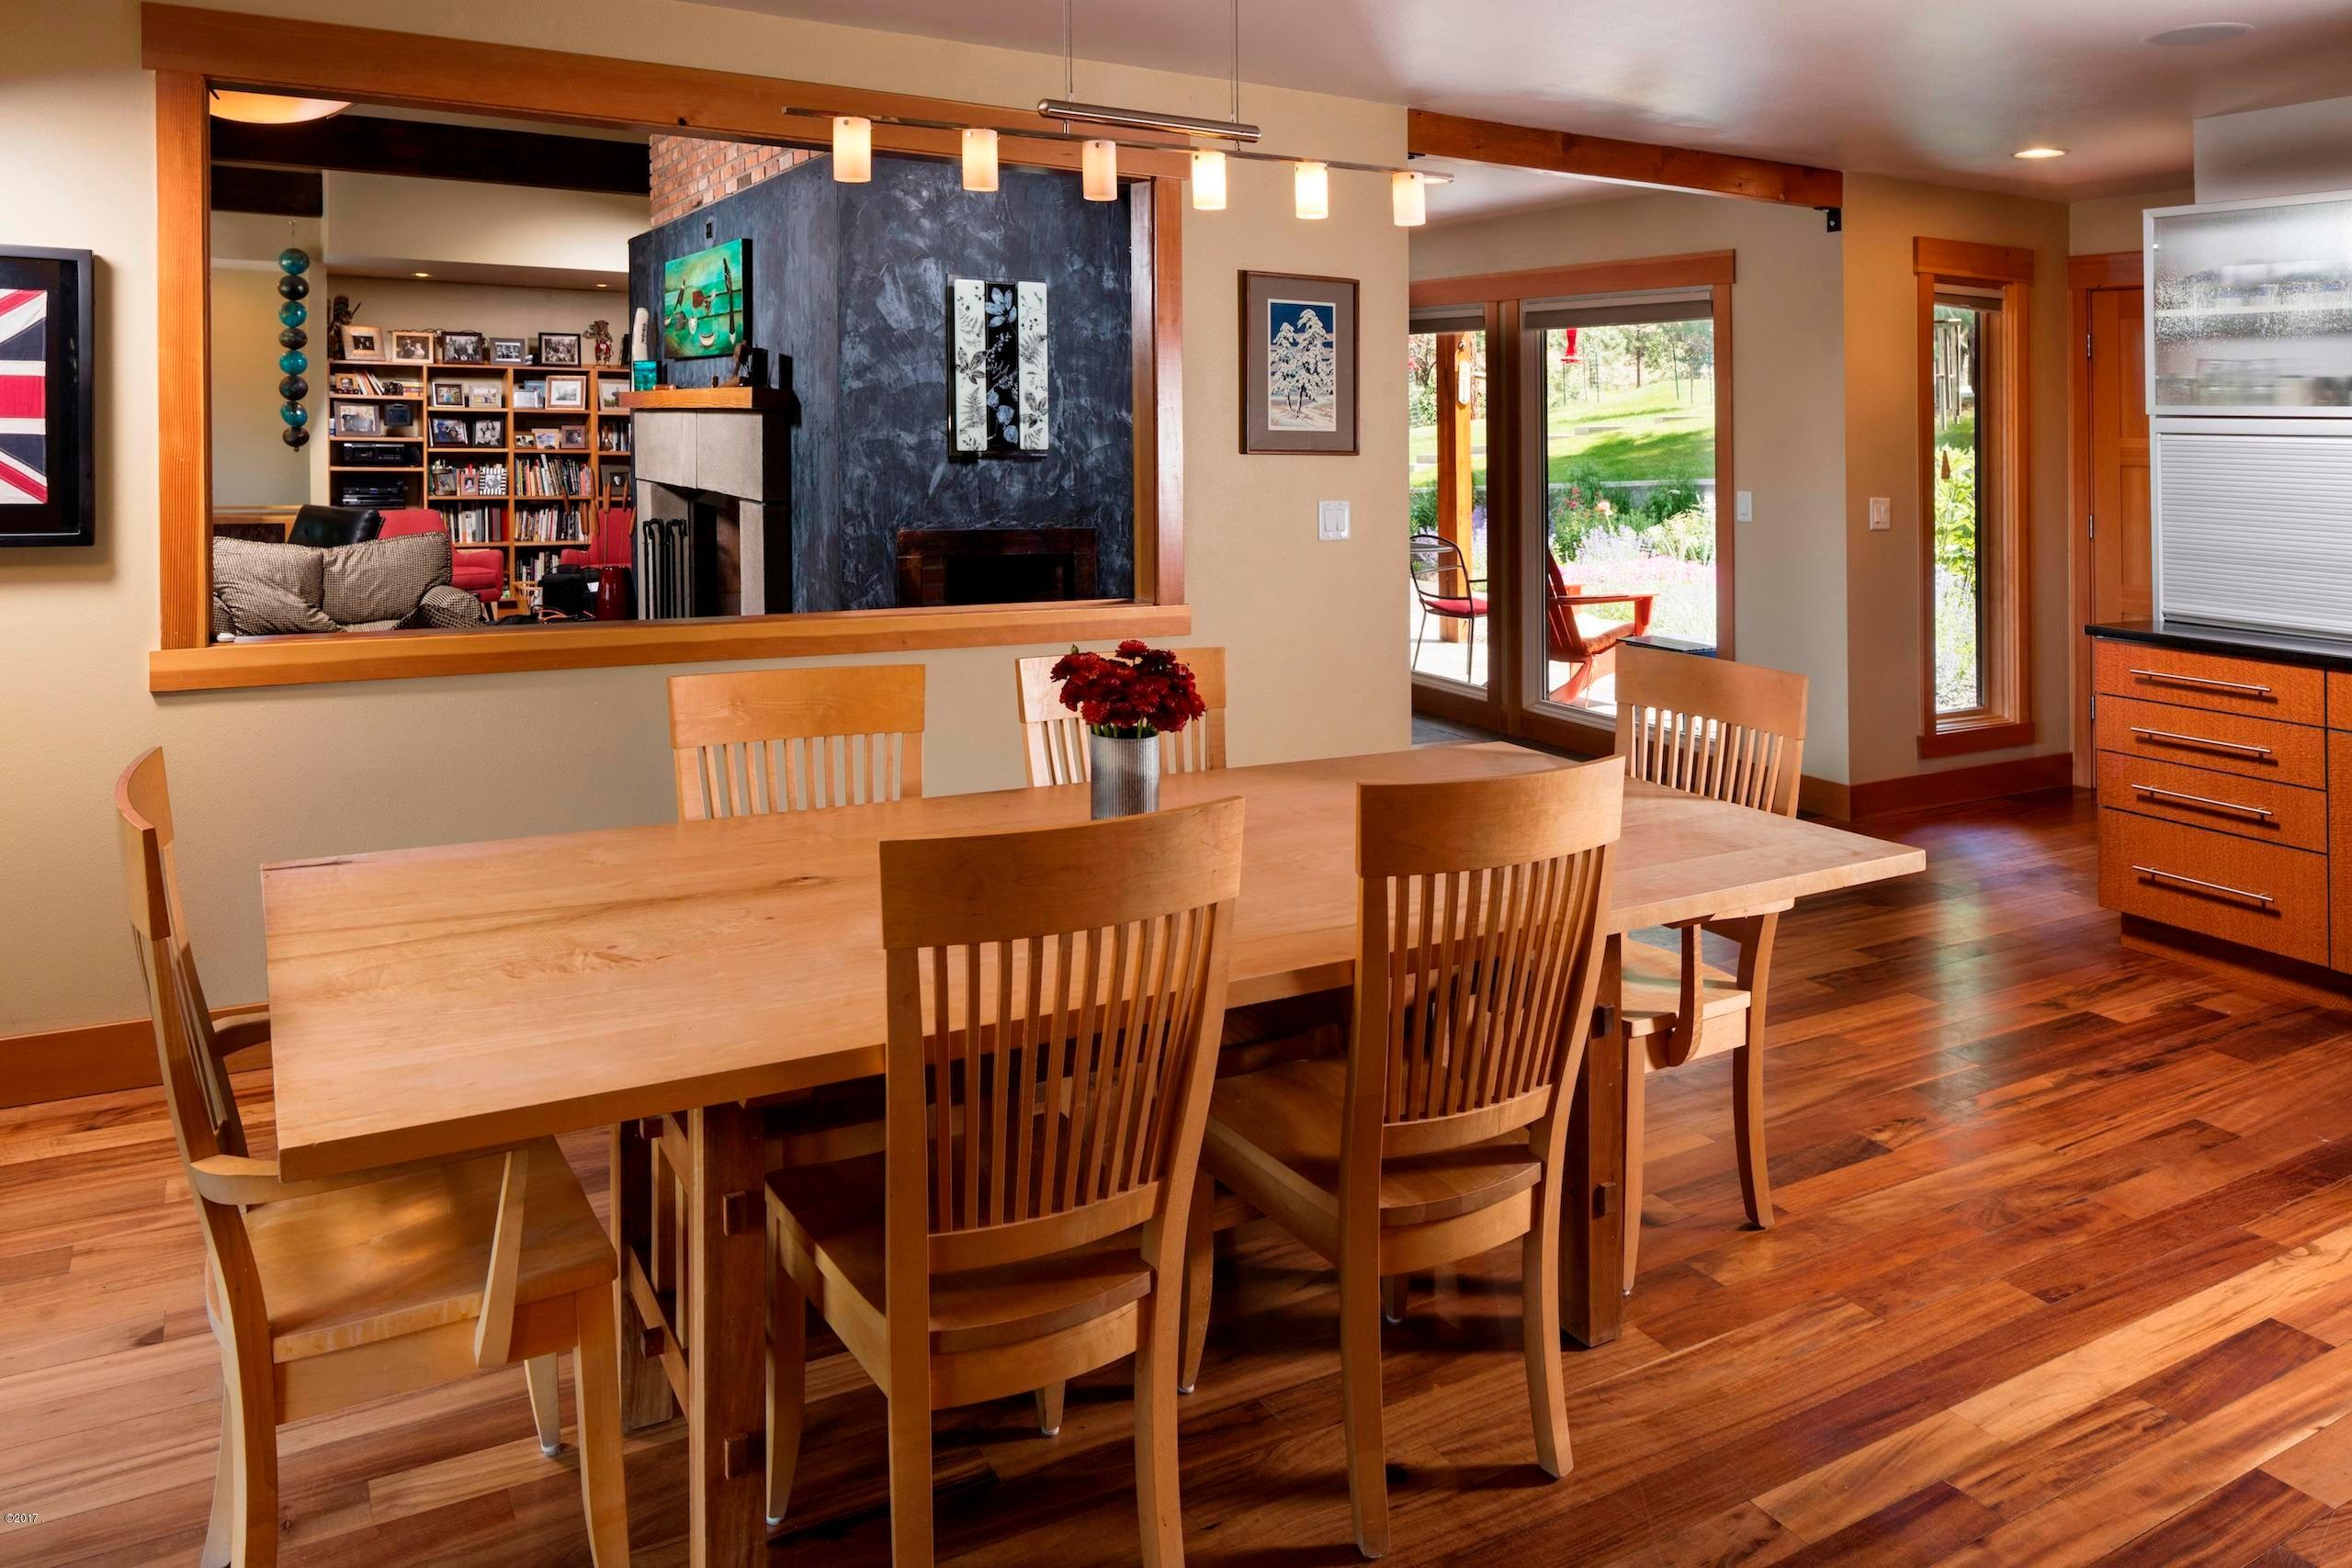 Additional photo for property listing at 2 Elk Ridge Court 2 Elk Ridge Court Missoula, Montana 59802 United States